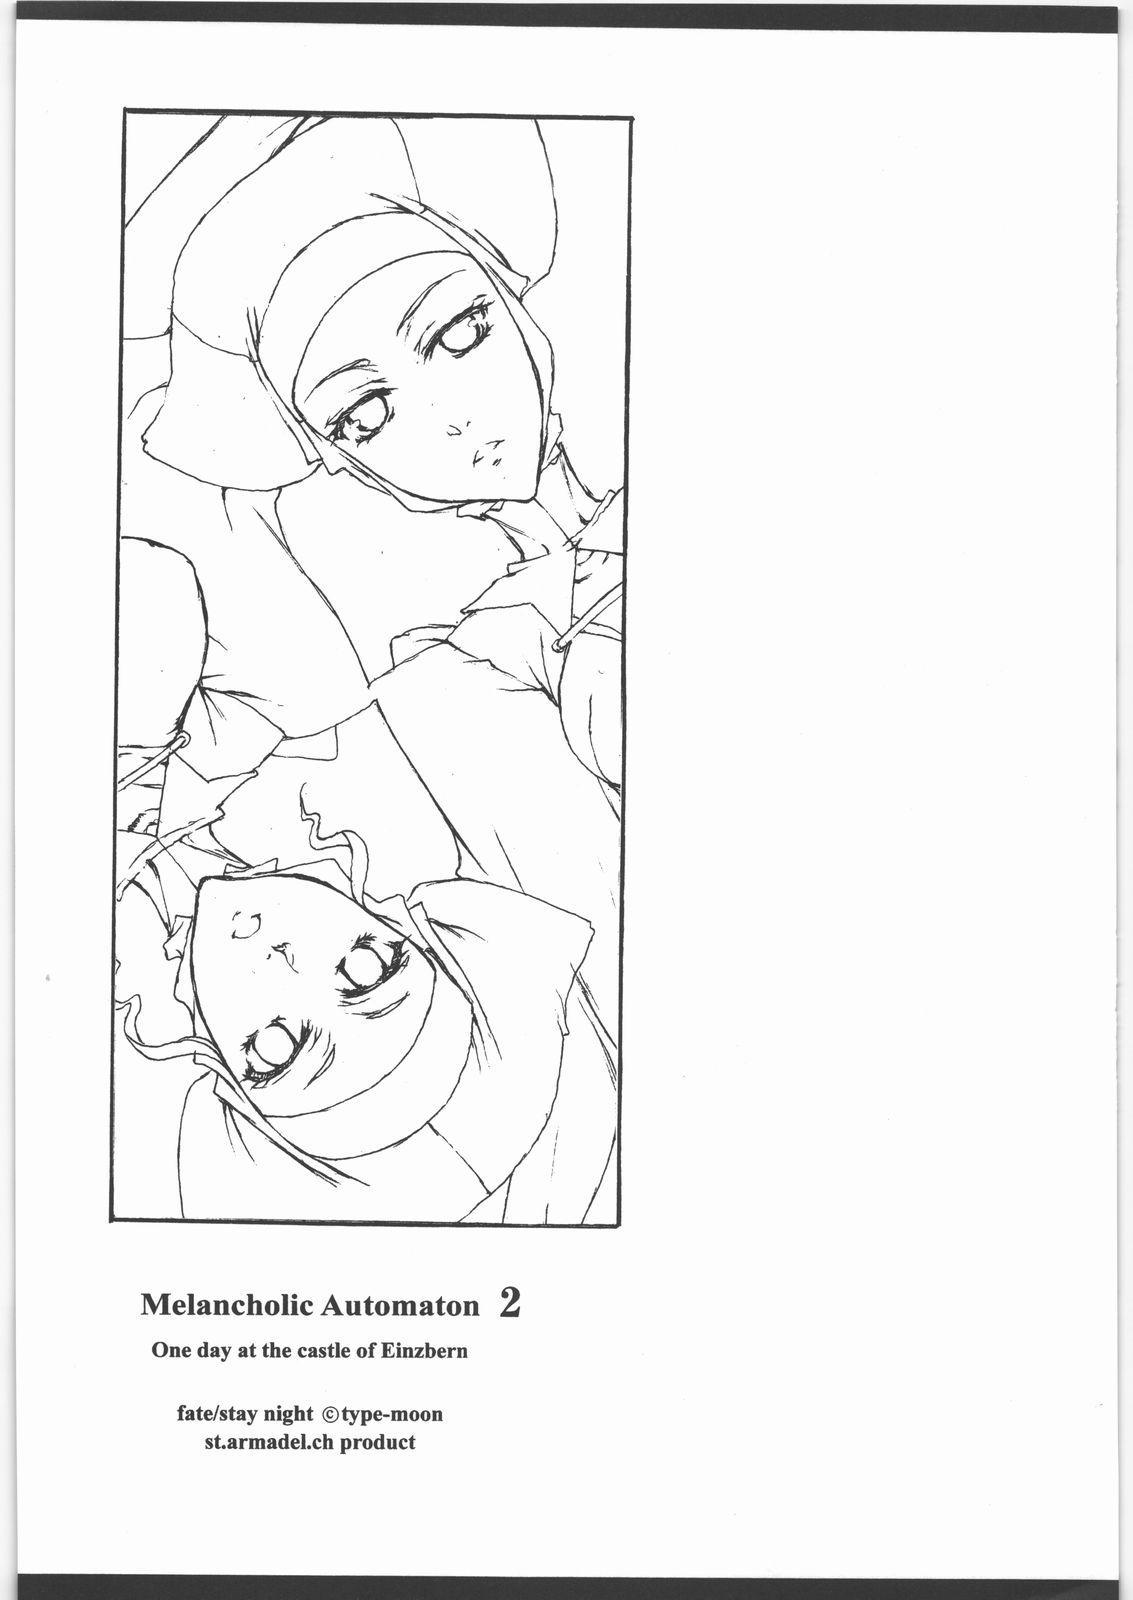 Melancholic Automaton 2 - One day at the castle of Einzbern 17